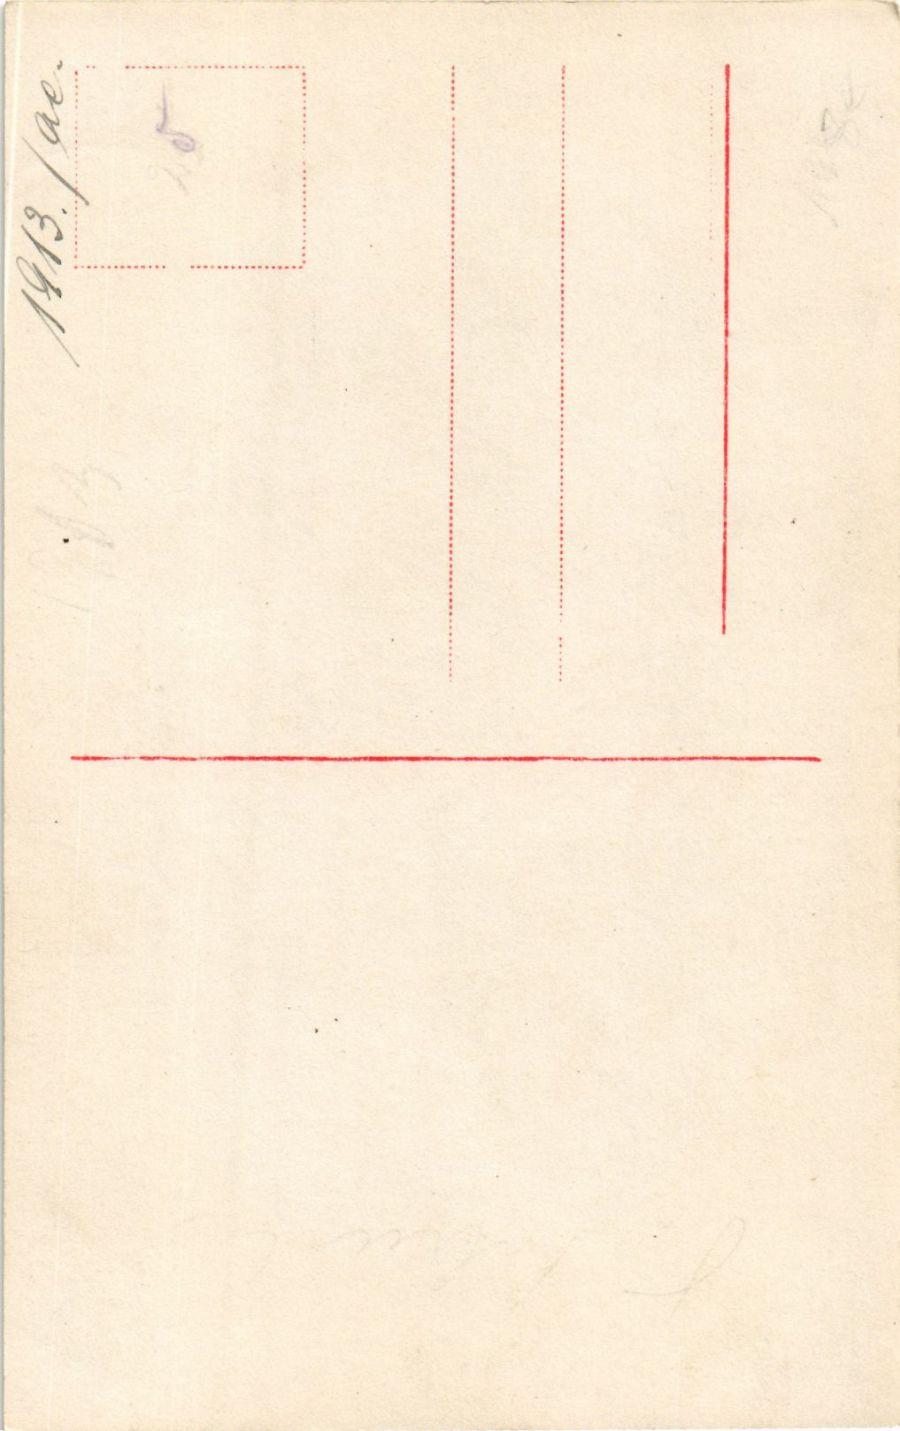 CPA-AK-Prinz-Luitpold-u-Albrecht-v-Bayern-GERMAN-ROYALTY-867357 Indexbild 2